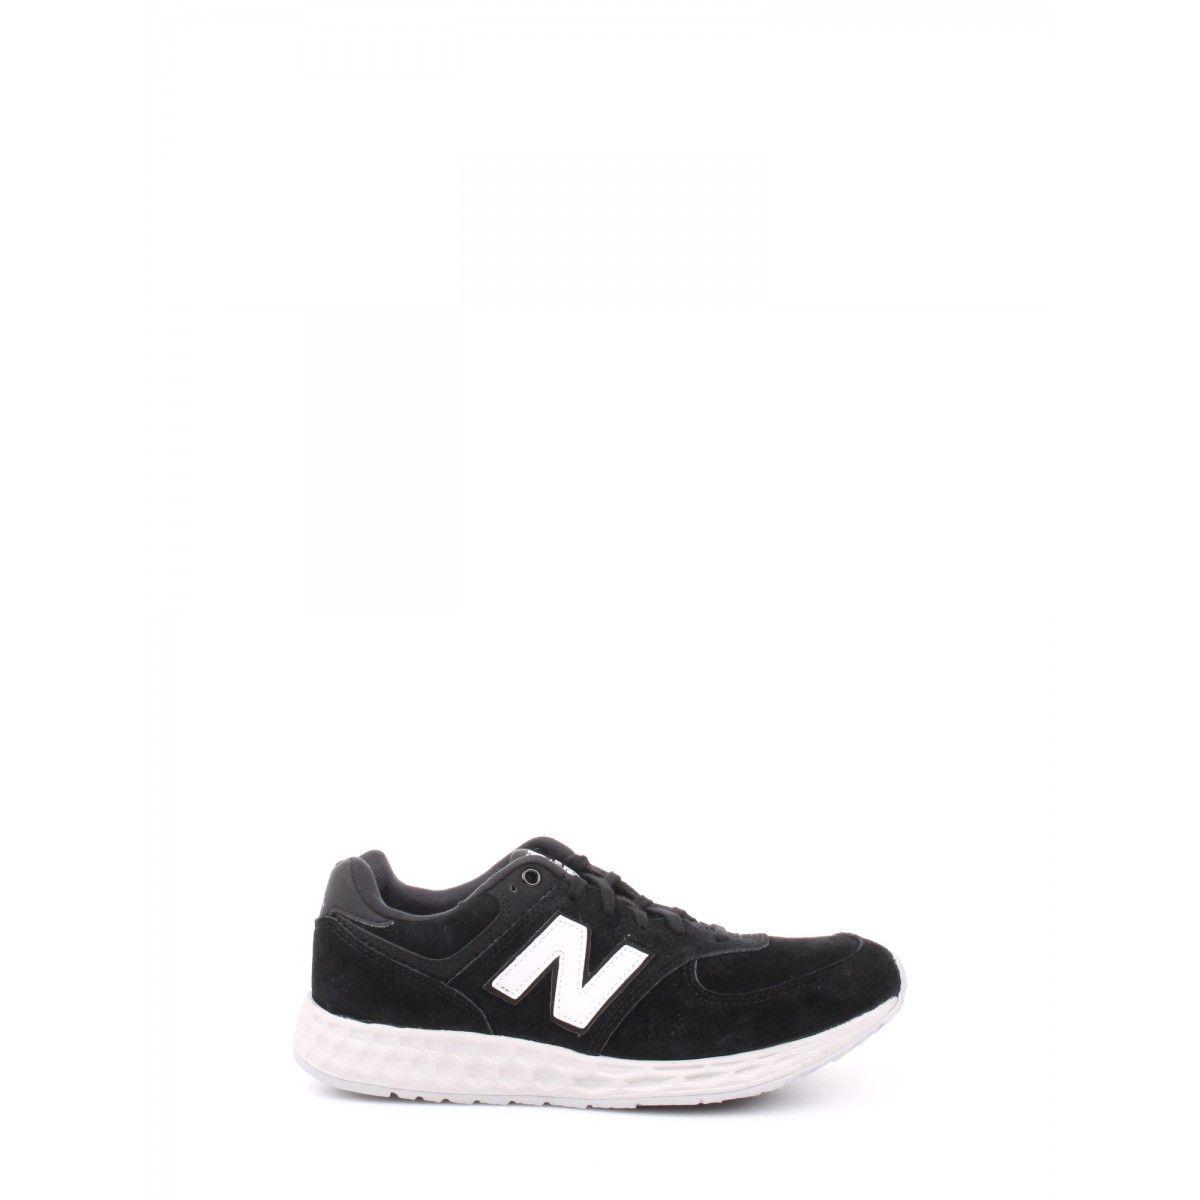 New balance - Leather/synthetic/mesh grey/black MFL574FC